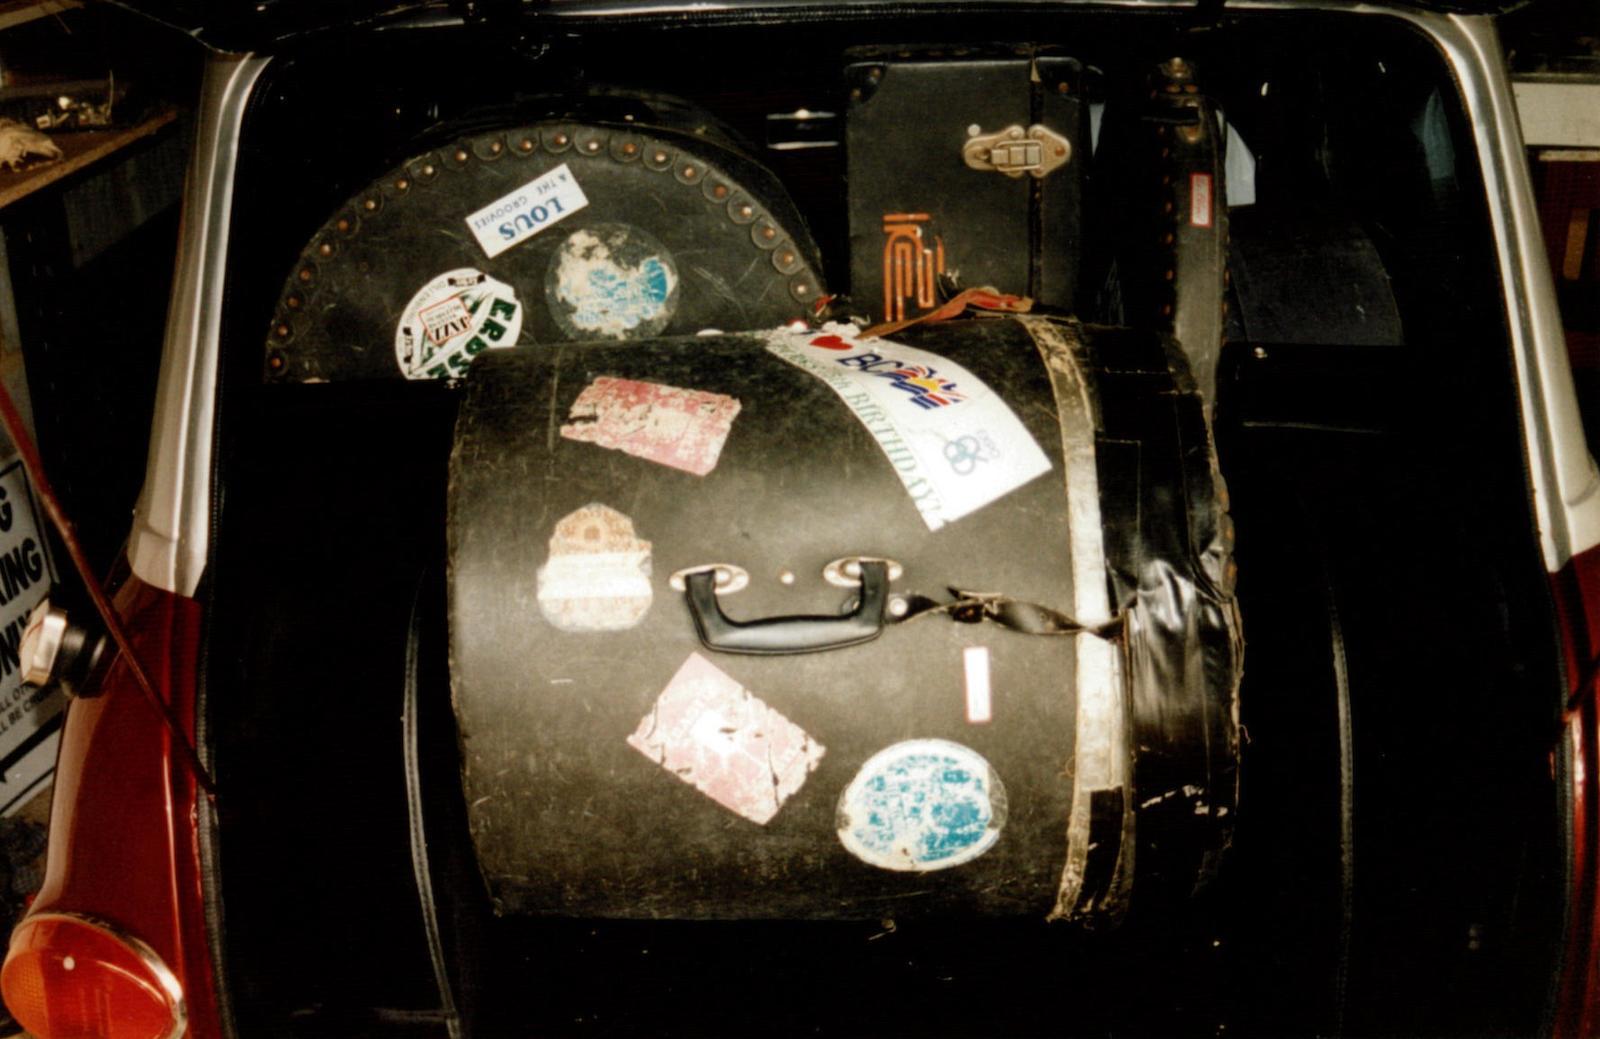 Ringo Starr's 1966 Austin Mini Cooper S fits a drum kit in the trunk